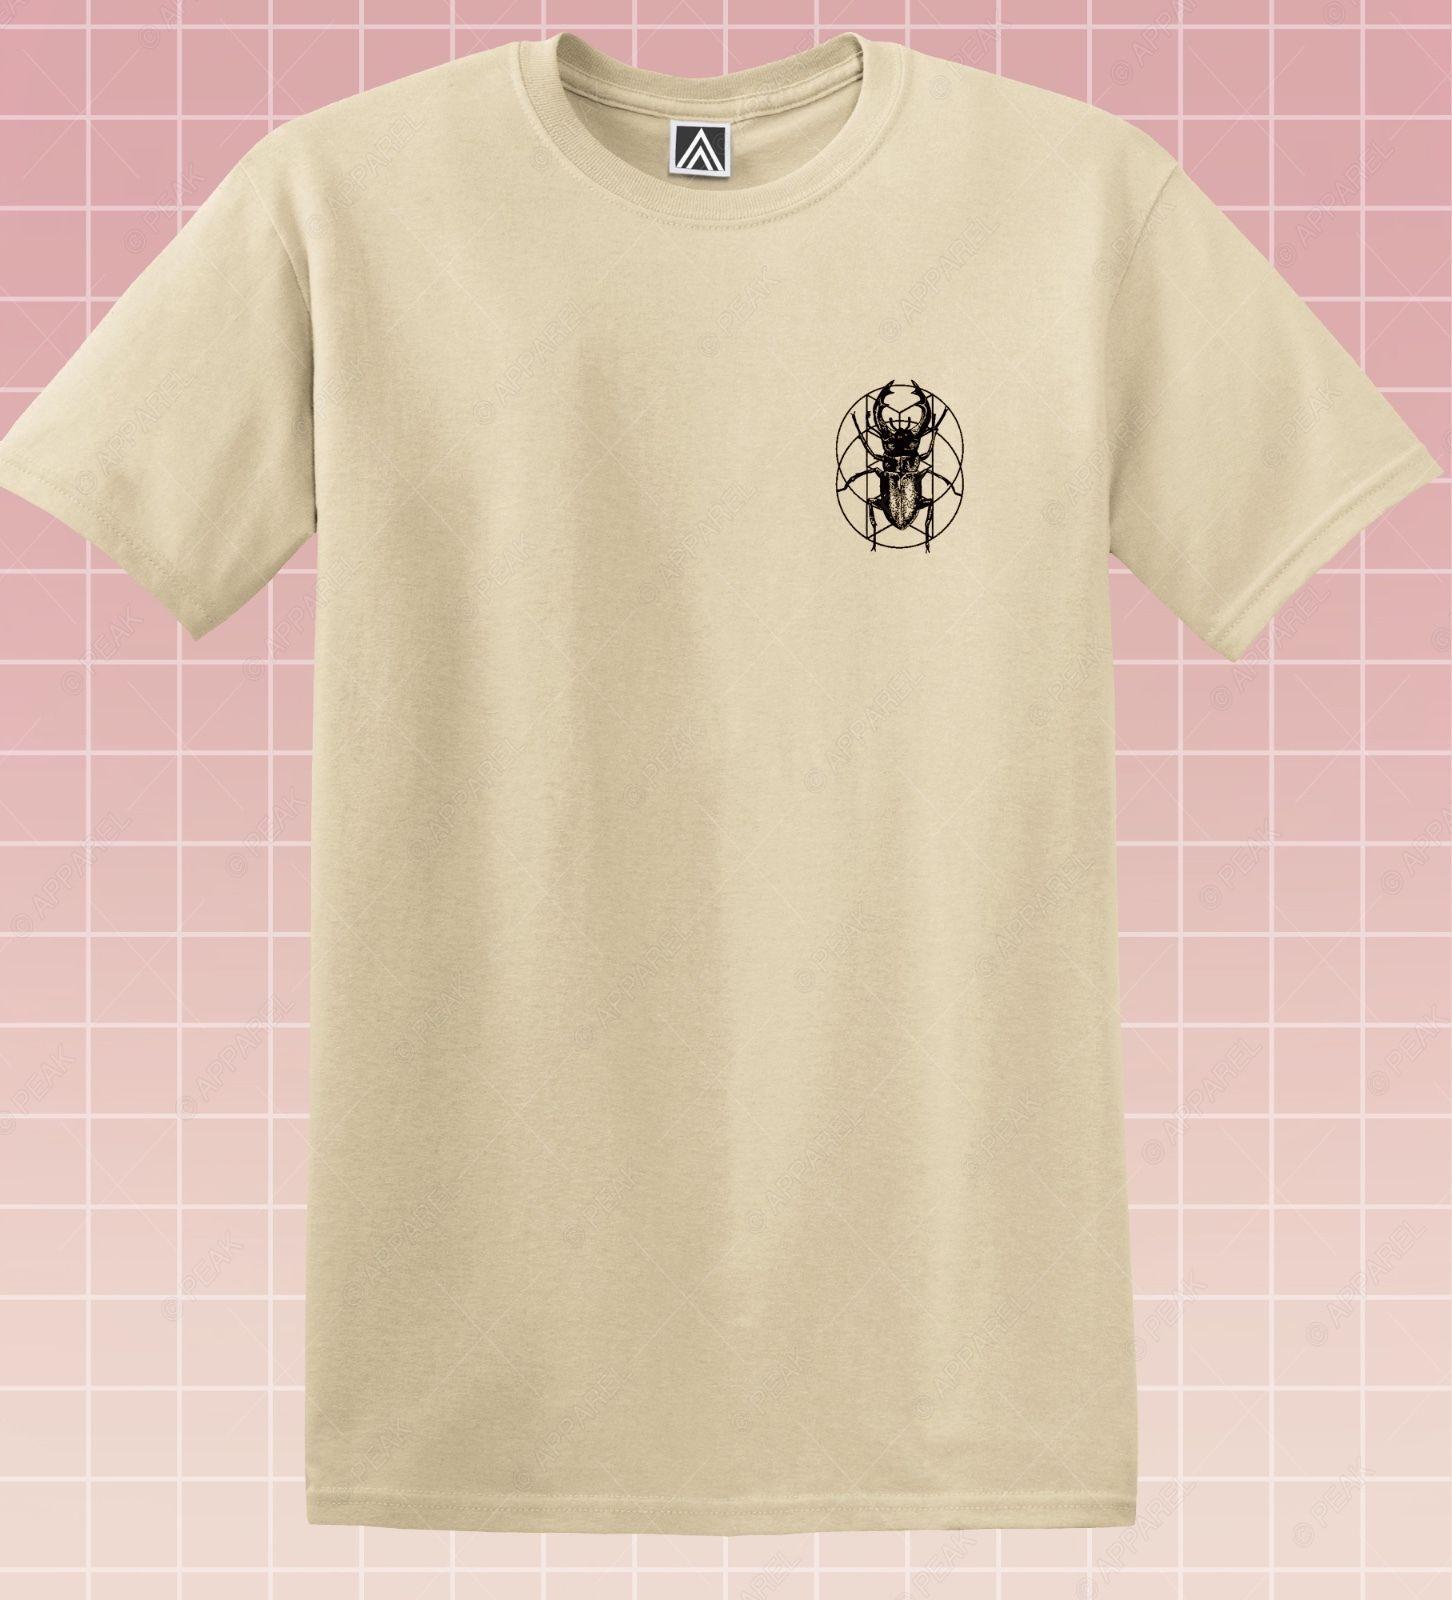 VENZULIA Mens Shrink-Less Crewneck T-Shirts 2PACK